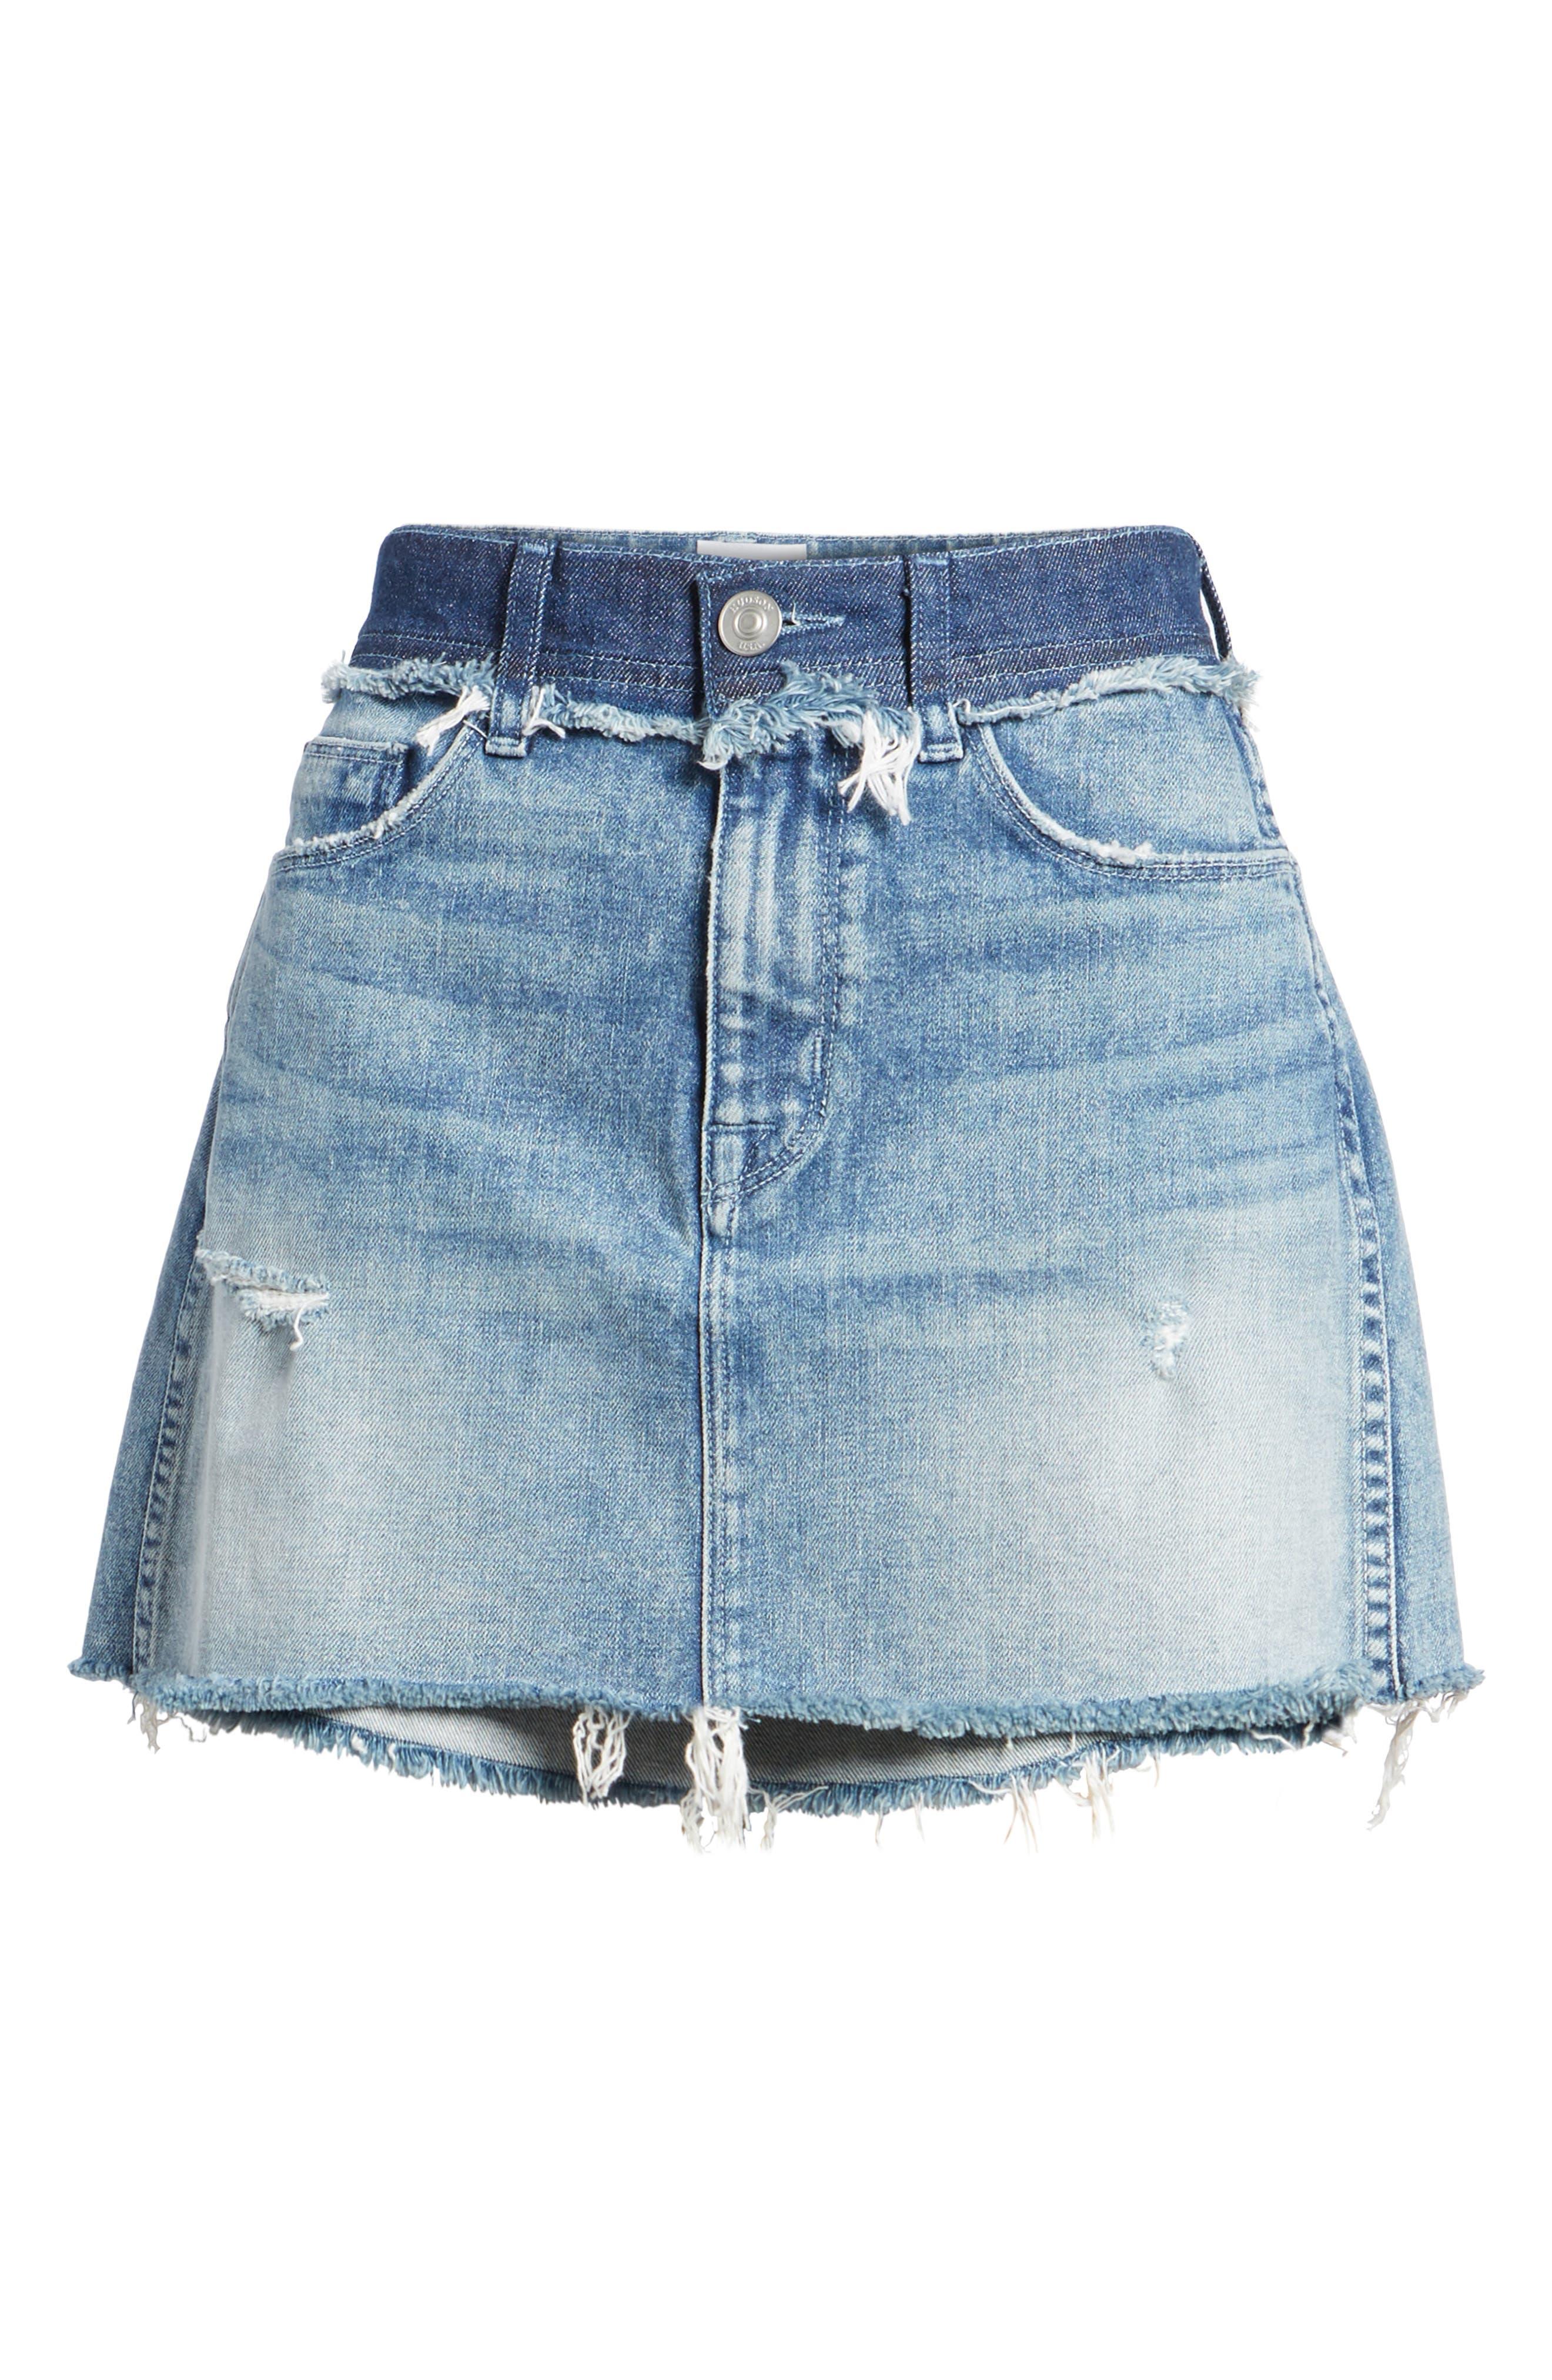 Vivid Cutoff Denim Miniskirt,                             Alternate thumbnail 6, color,                             401